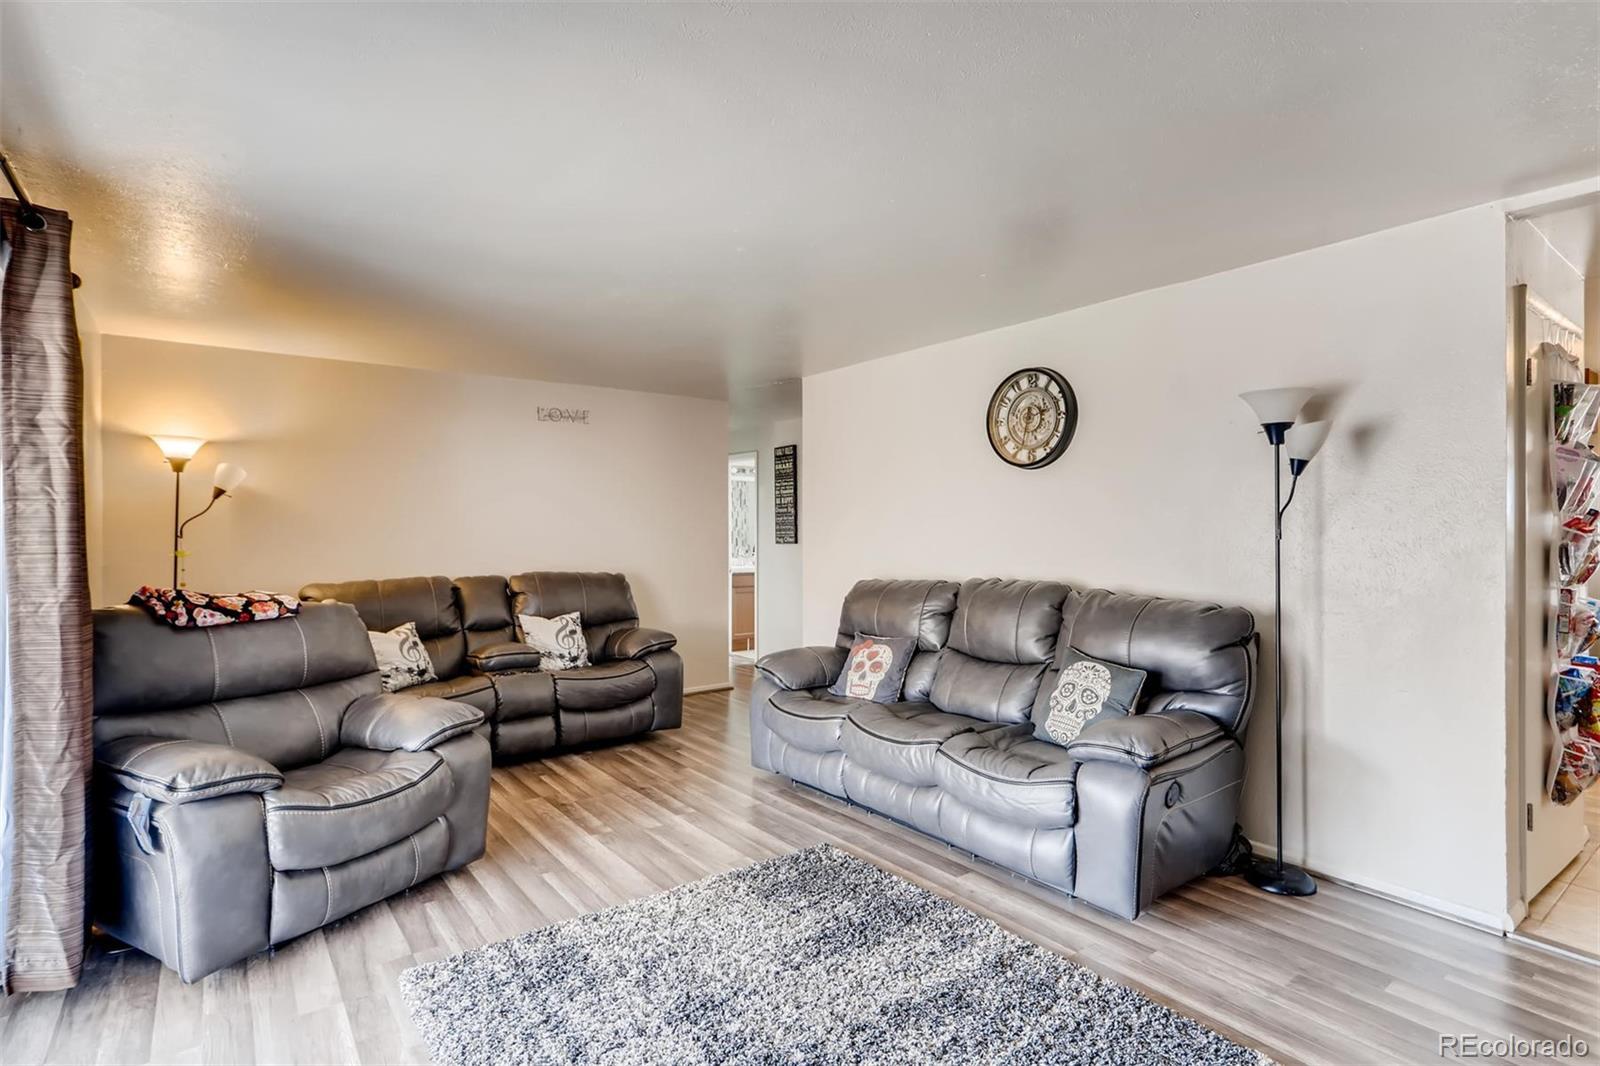 MLS# 7901545 - 3 - 1389 Douglas Drive, Denver, CO 80221